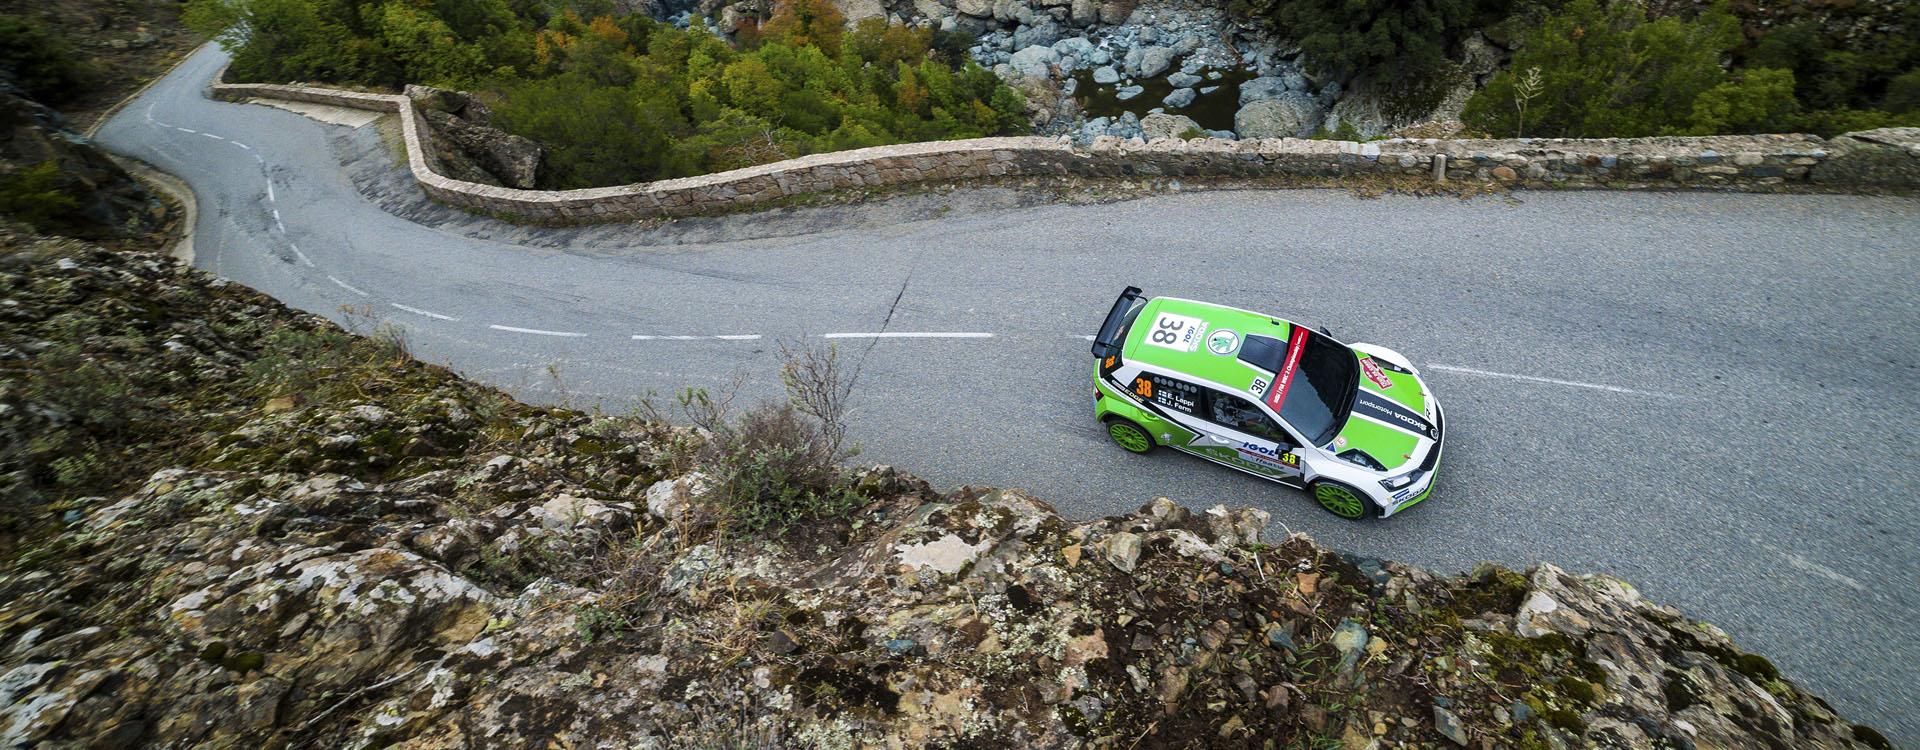 Tour De Corse Rally Of Corners ŠKODA Motorsport - Wrc sweden 2016 map